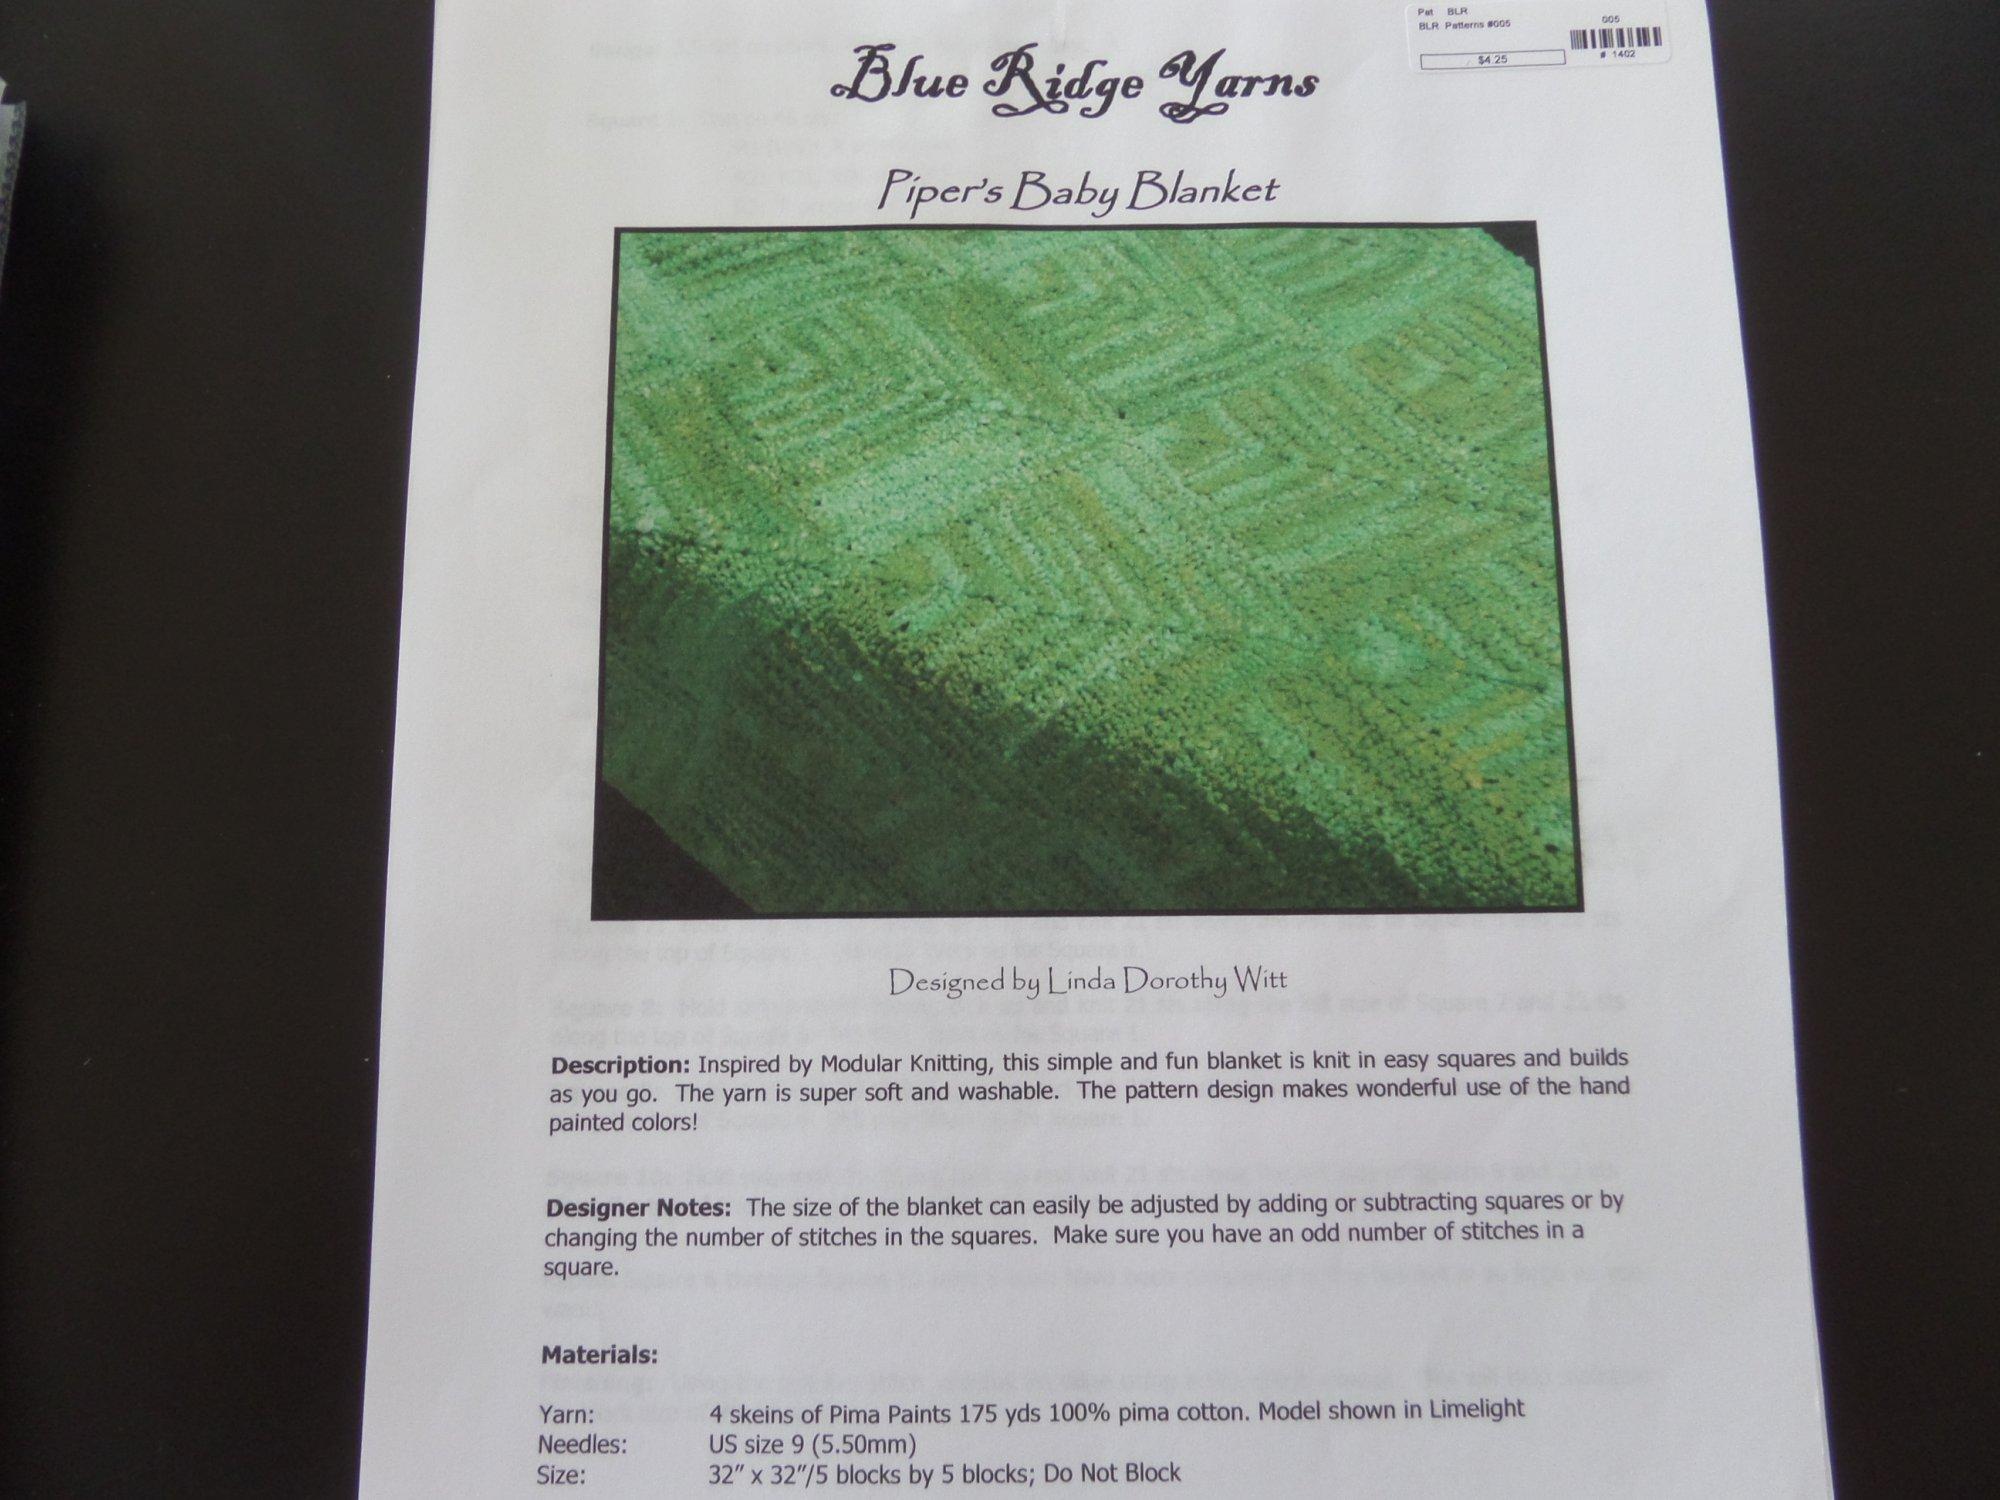 Pima Paints Patterns from Blue Ridge Yarns